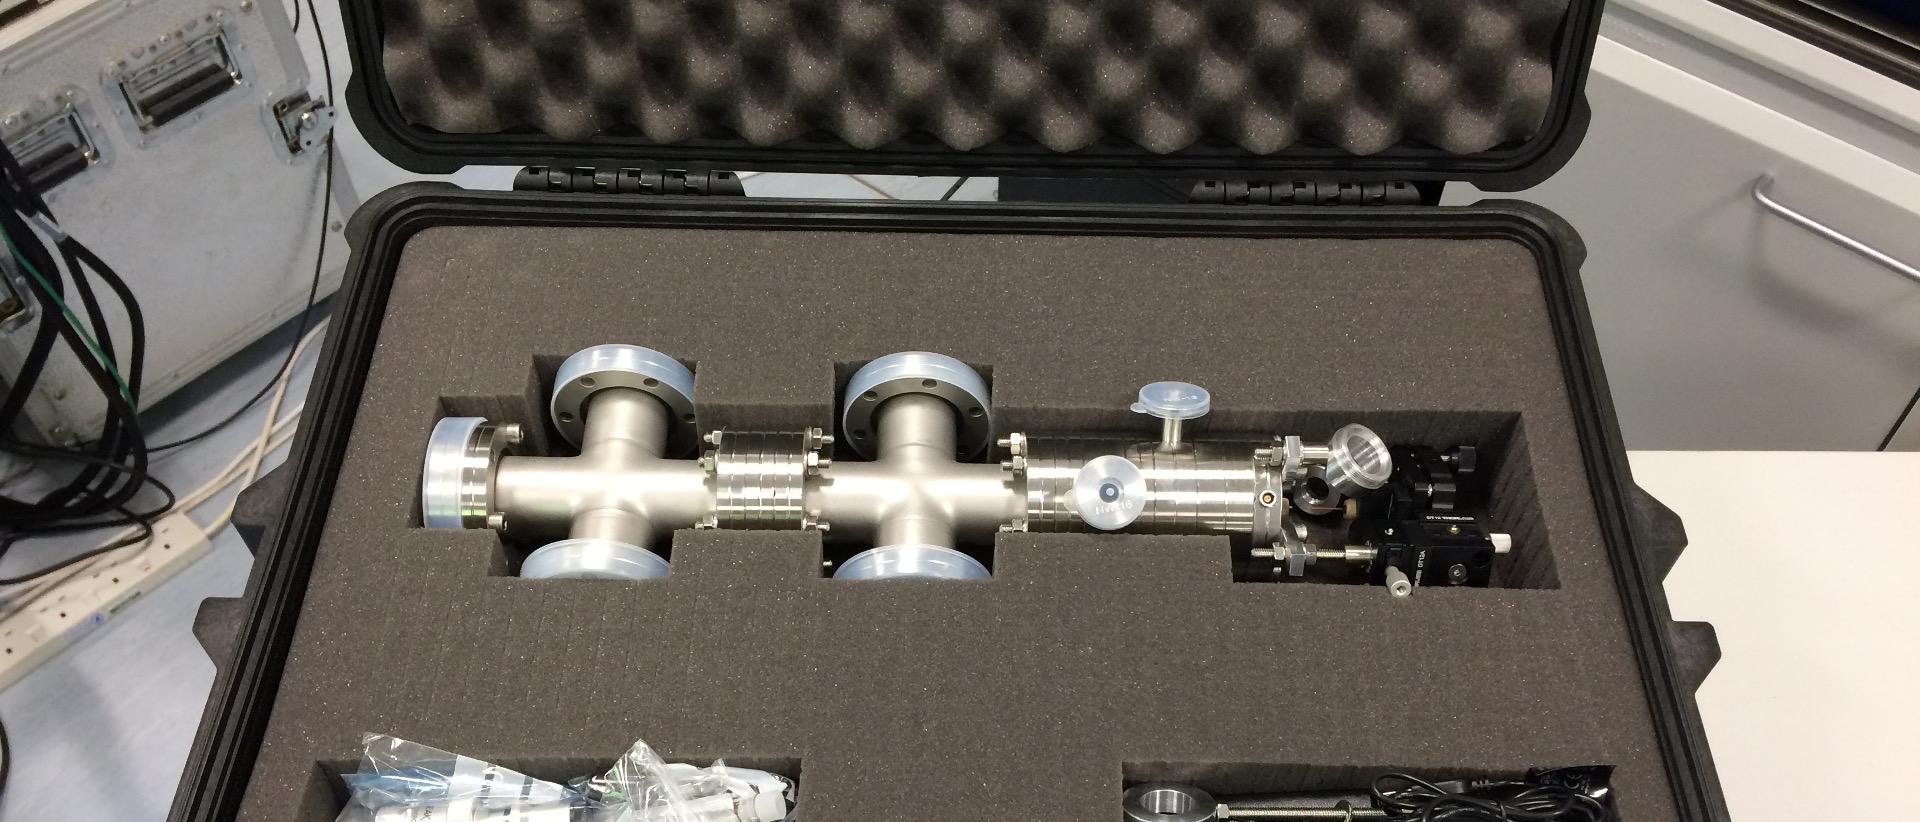 UHV4i ultra-high vacuum compatible electrospray deposition